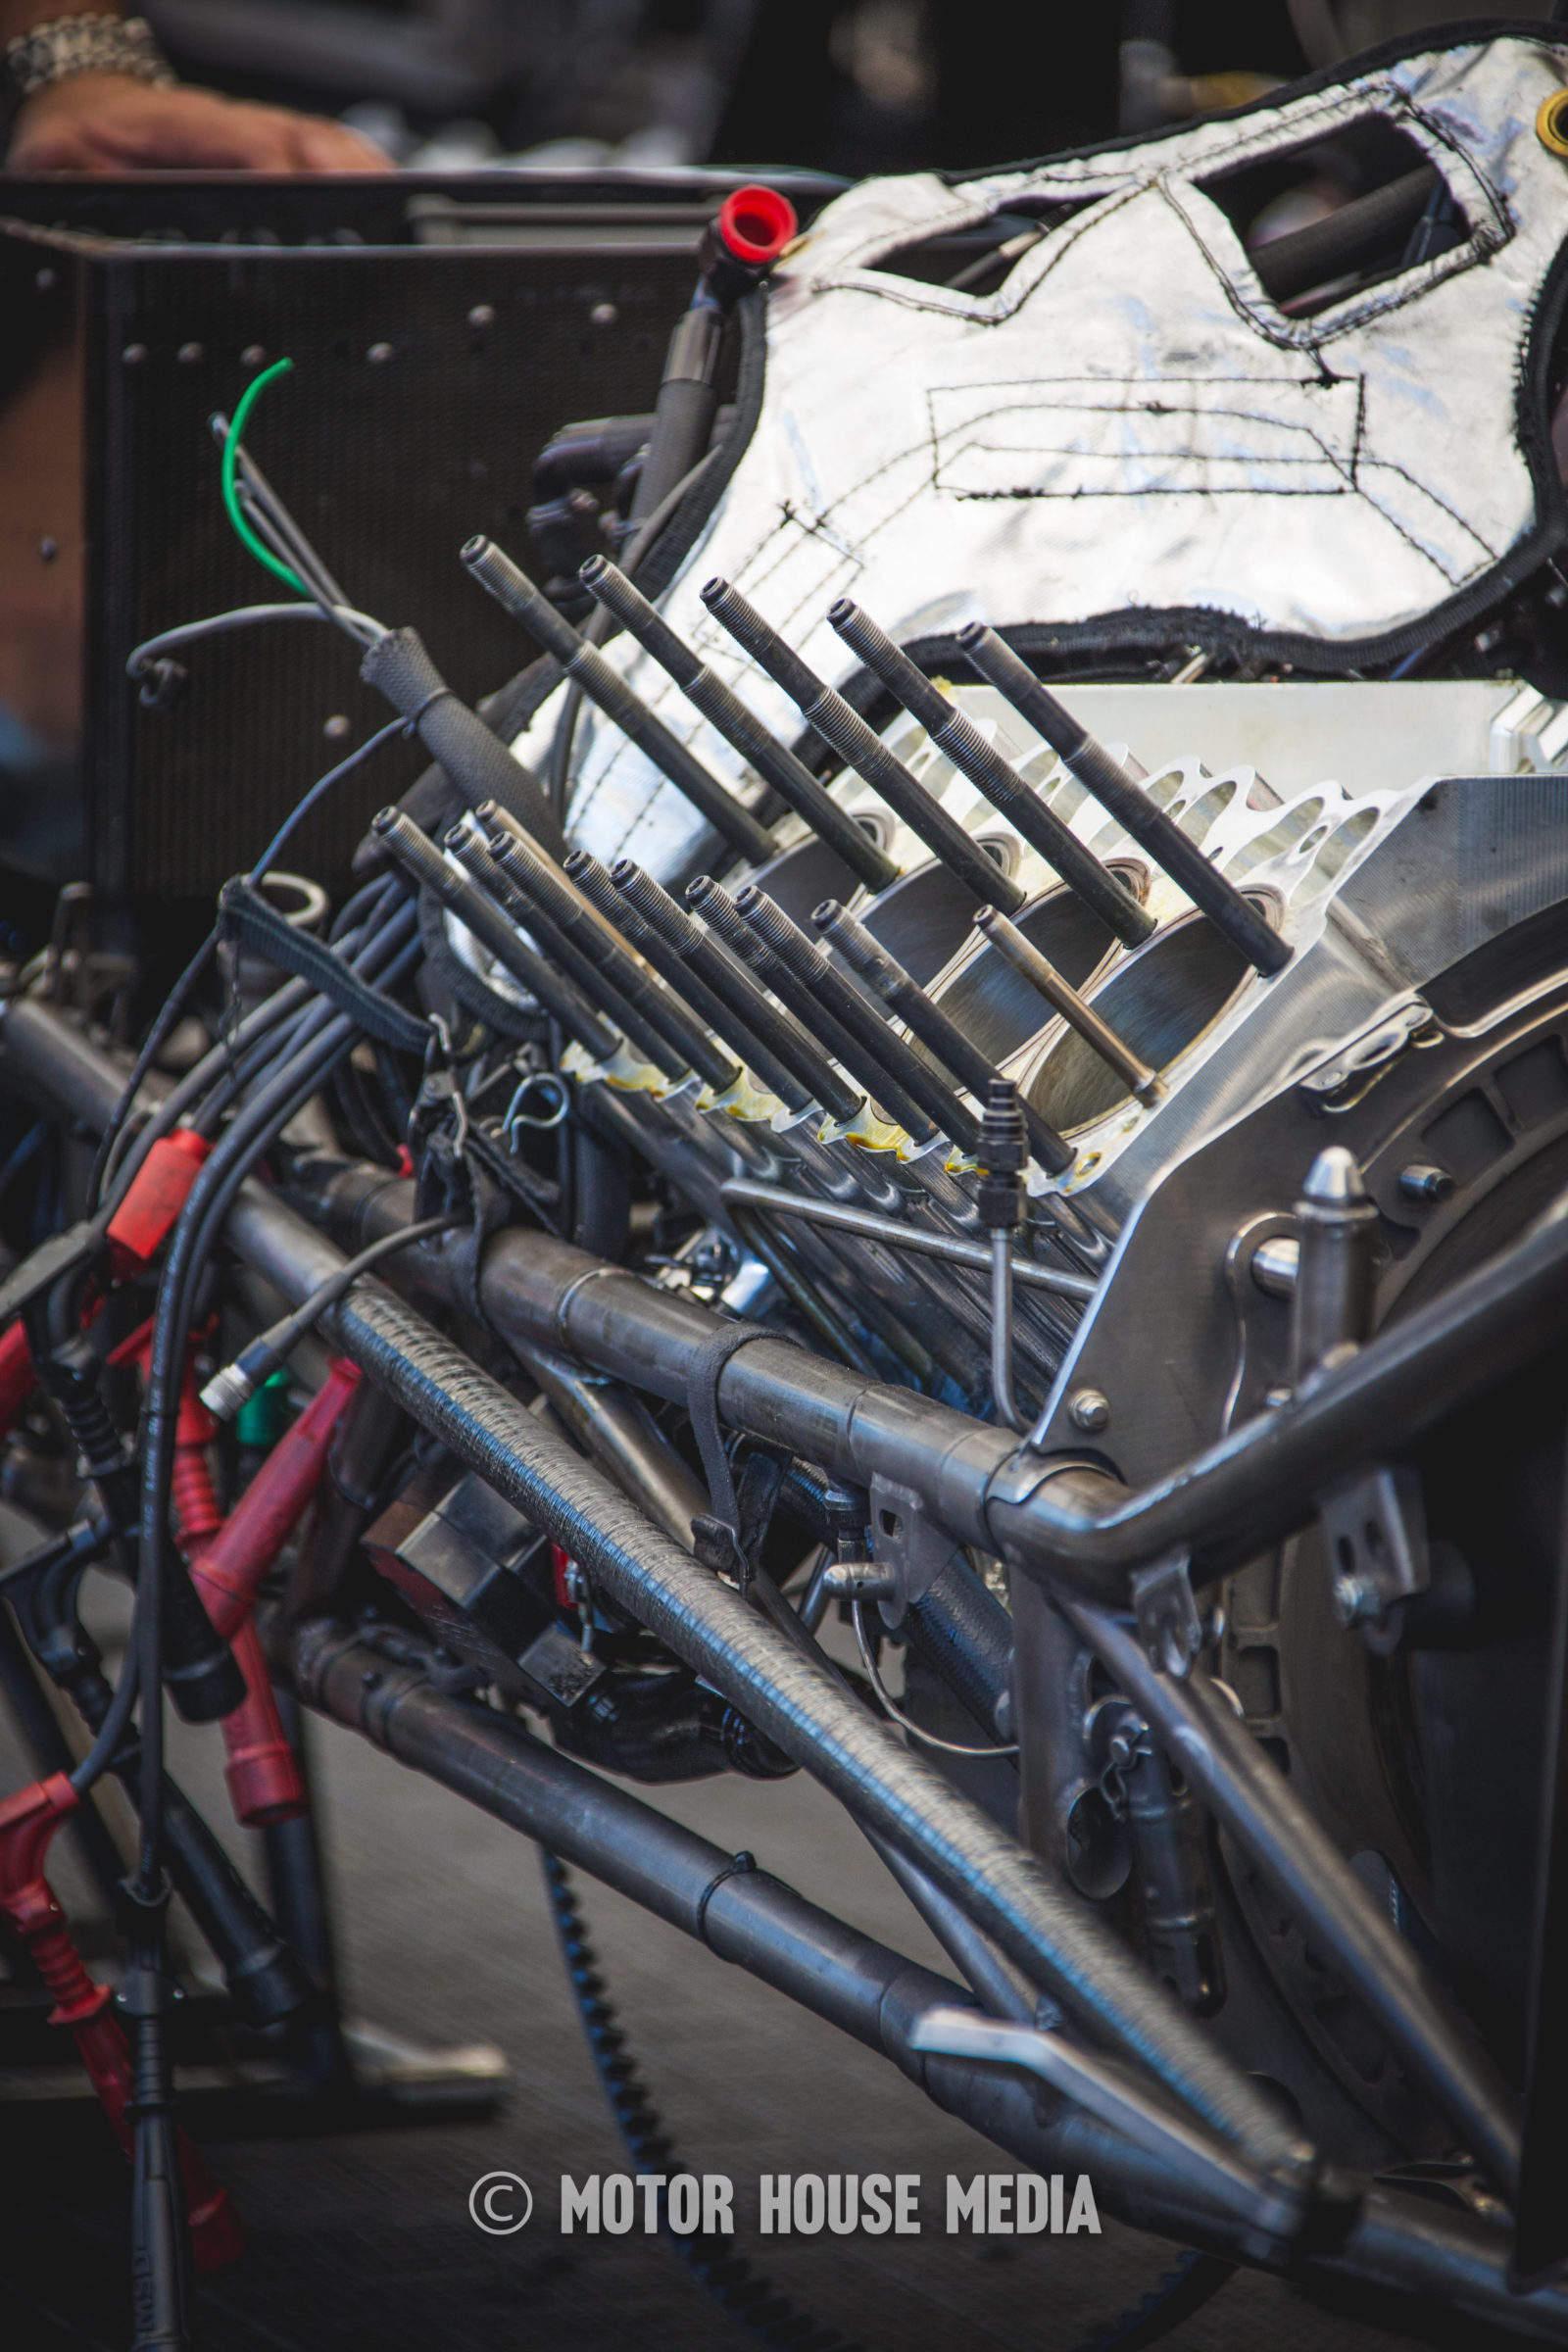 NHRA Courtney Force Funnycar engine teardown between rounds.